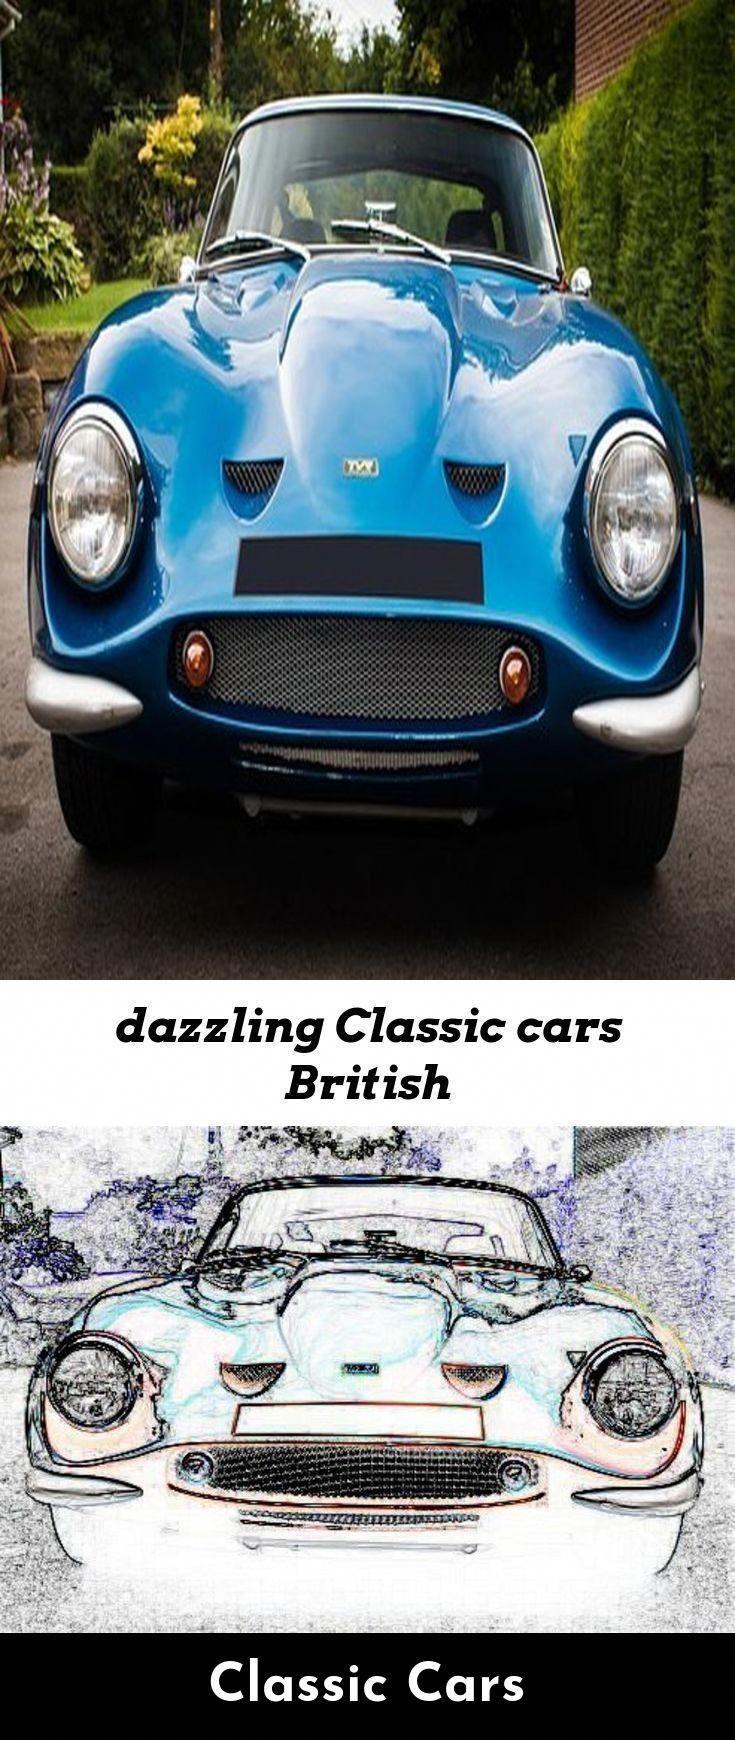 classic vintage cars for sale vintage cars for sale